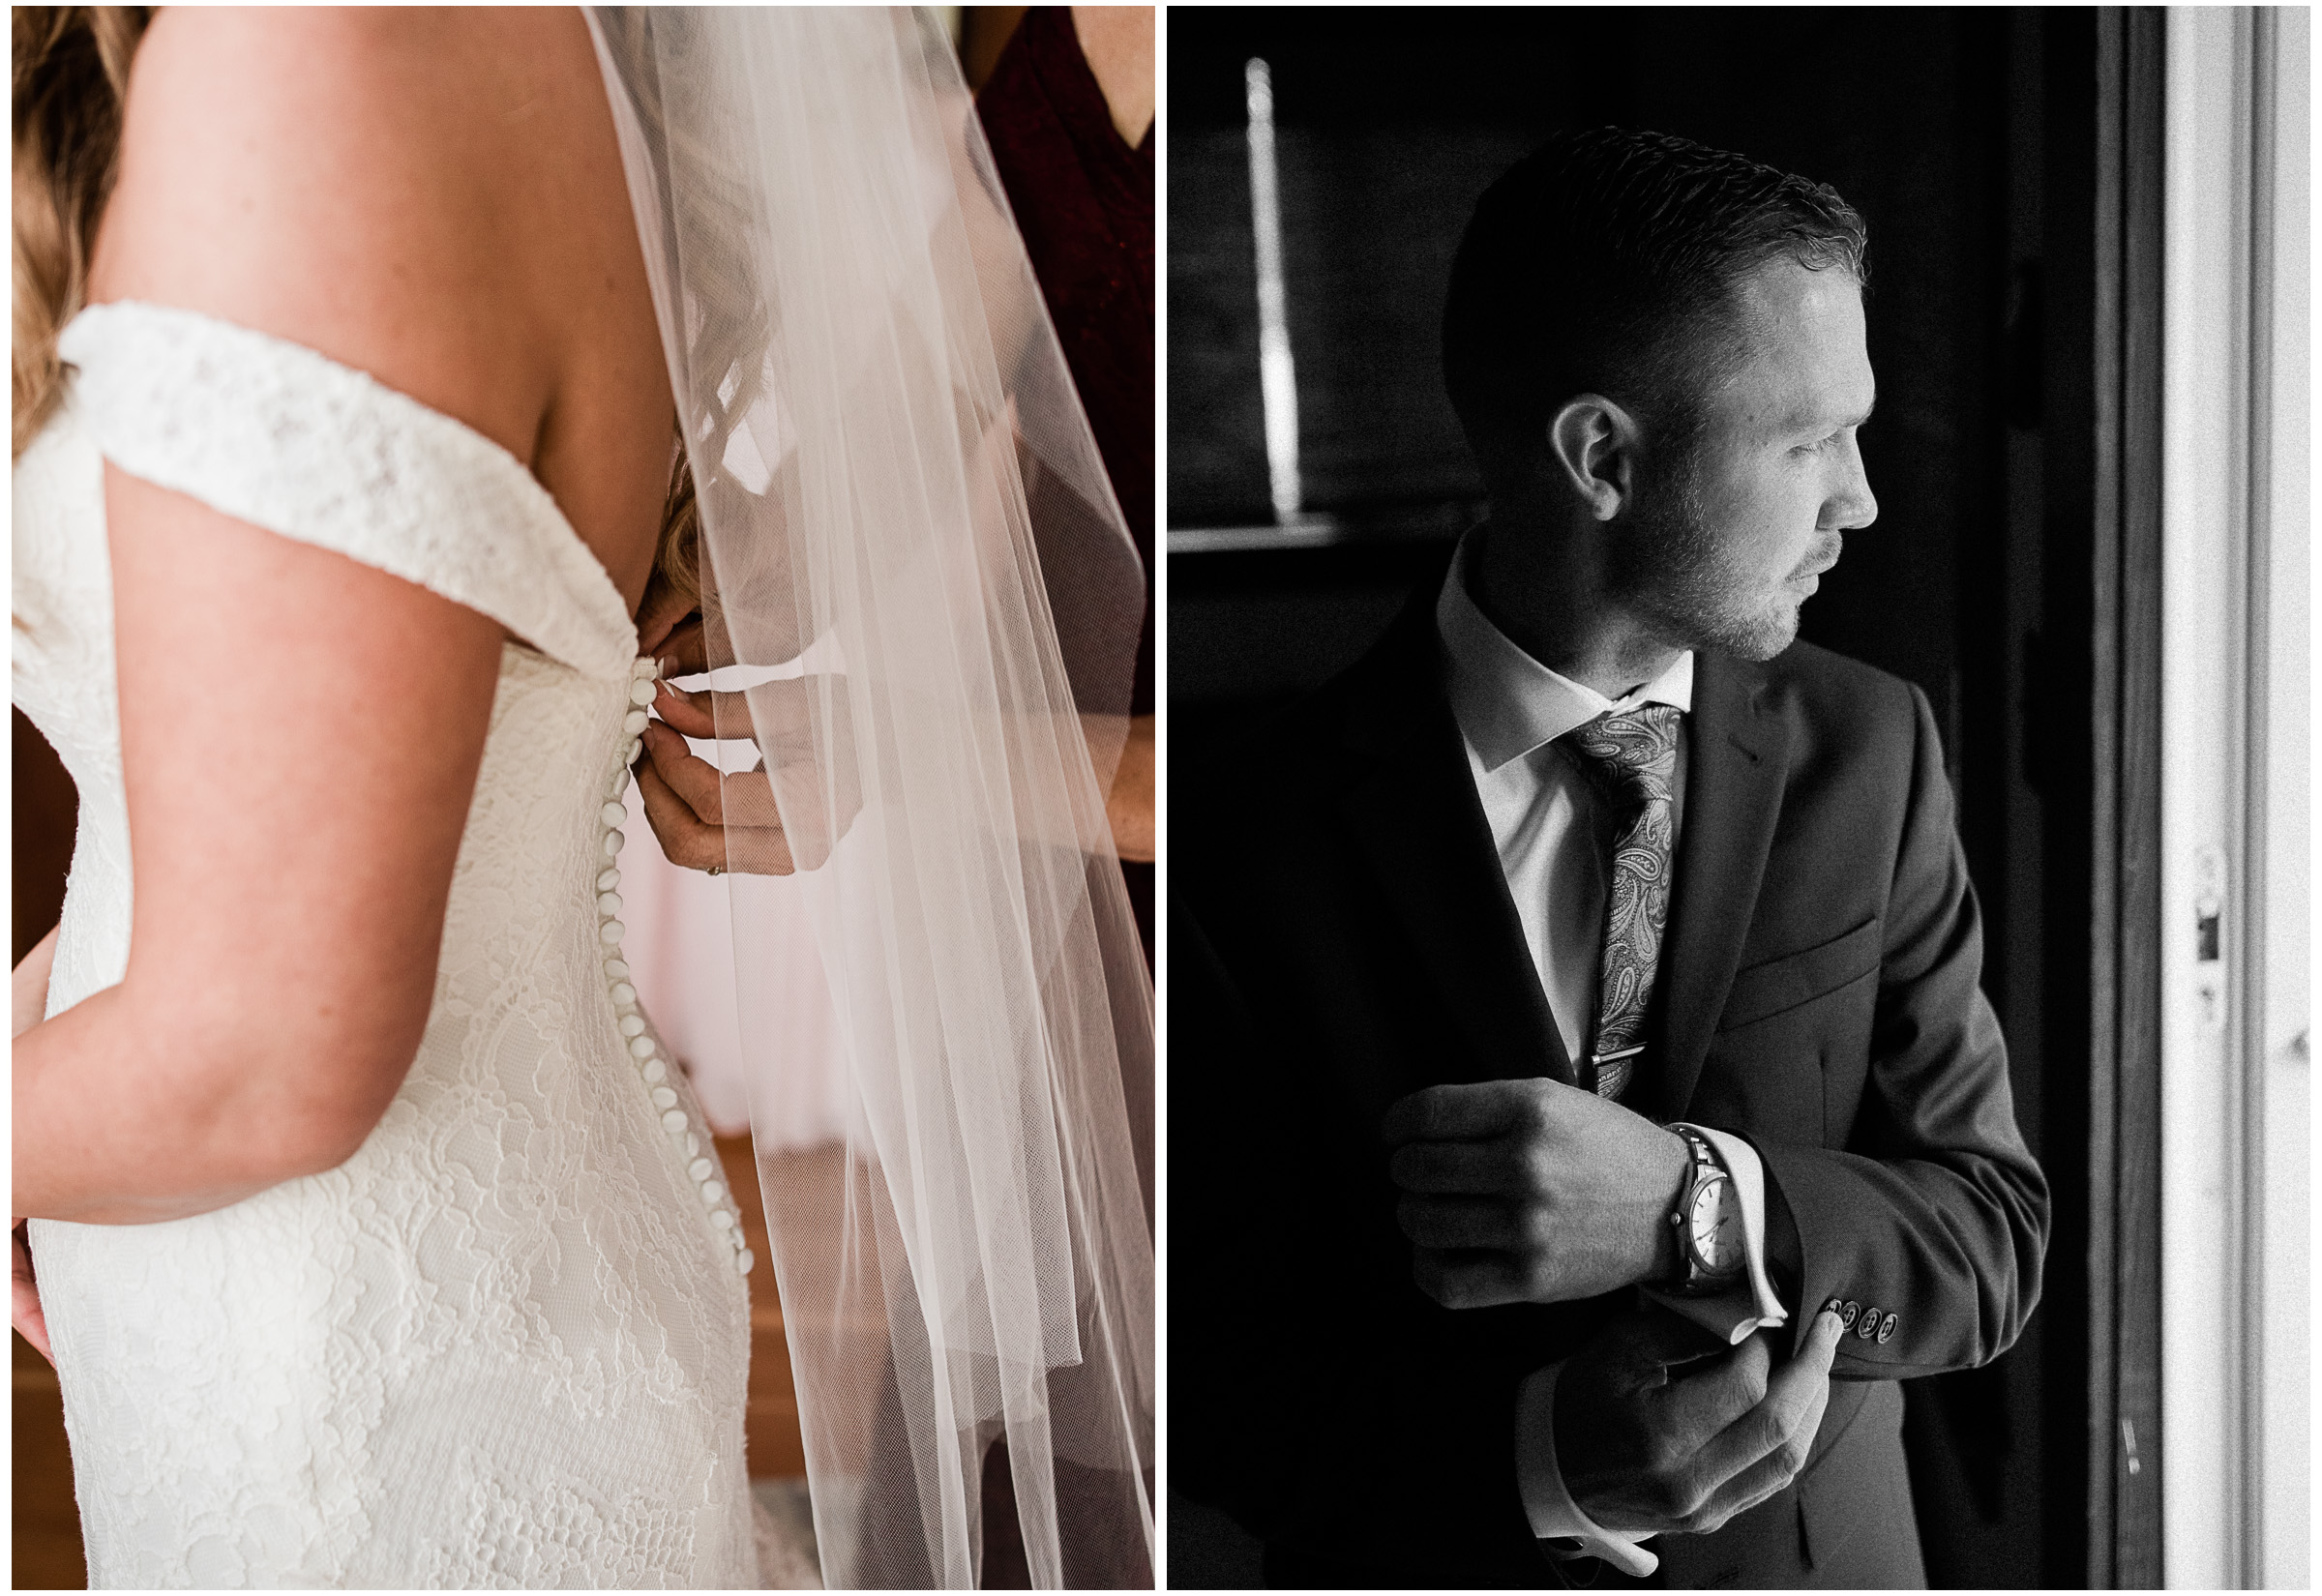 Winters Wedding - Sacramento Photographer - Field & Pond - Justin Wilcox Photography - 8.jpg